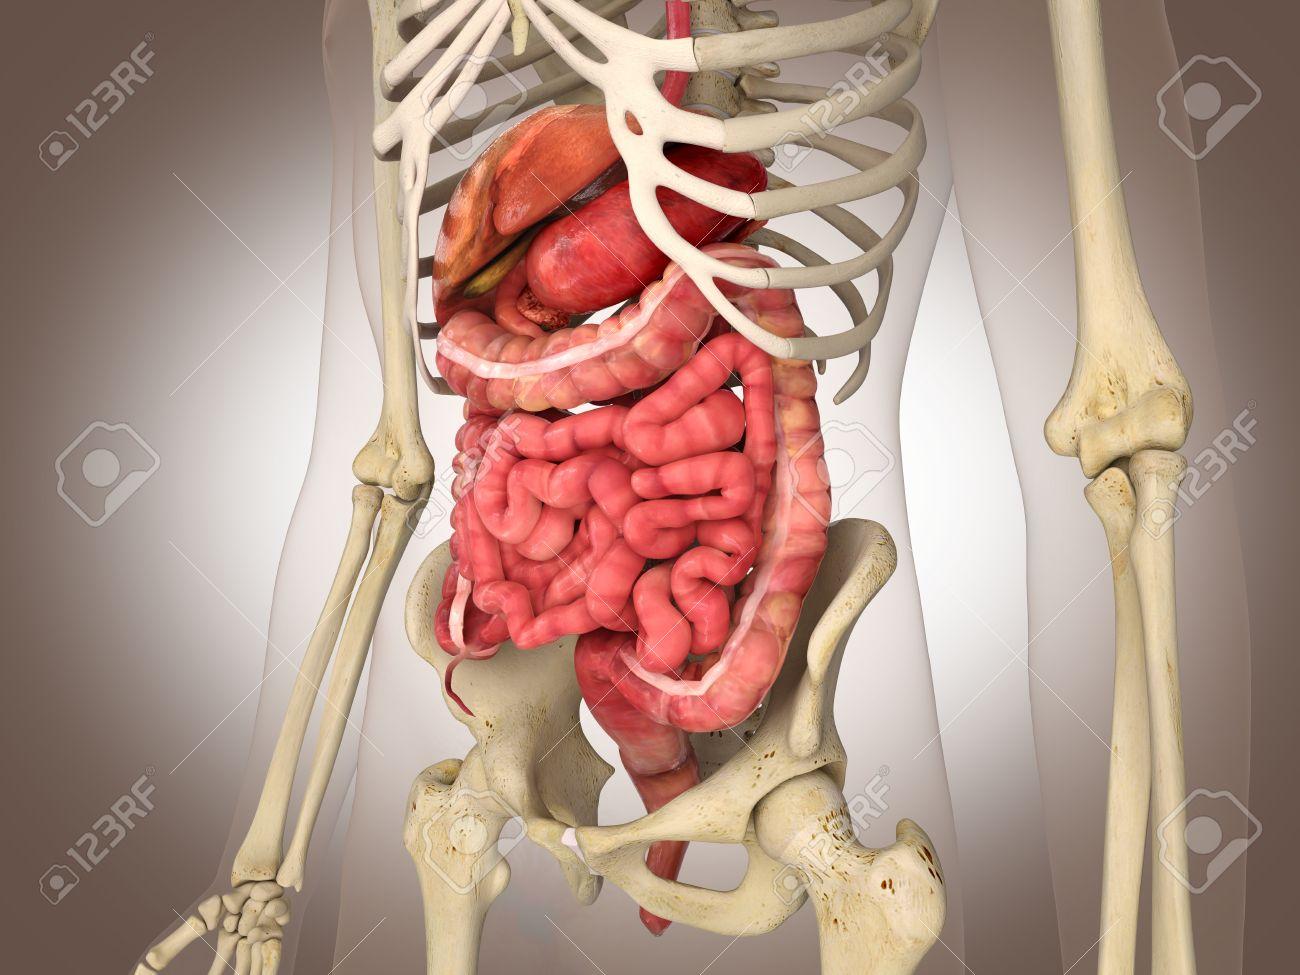 Man skeleton with internal organs 3 d digital rendering stock photo man skeleton with internal organs 3 d digital rendering ccuart Gallery